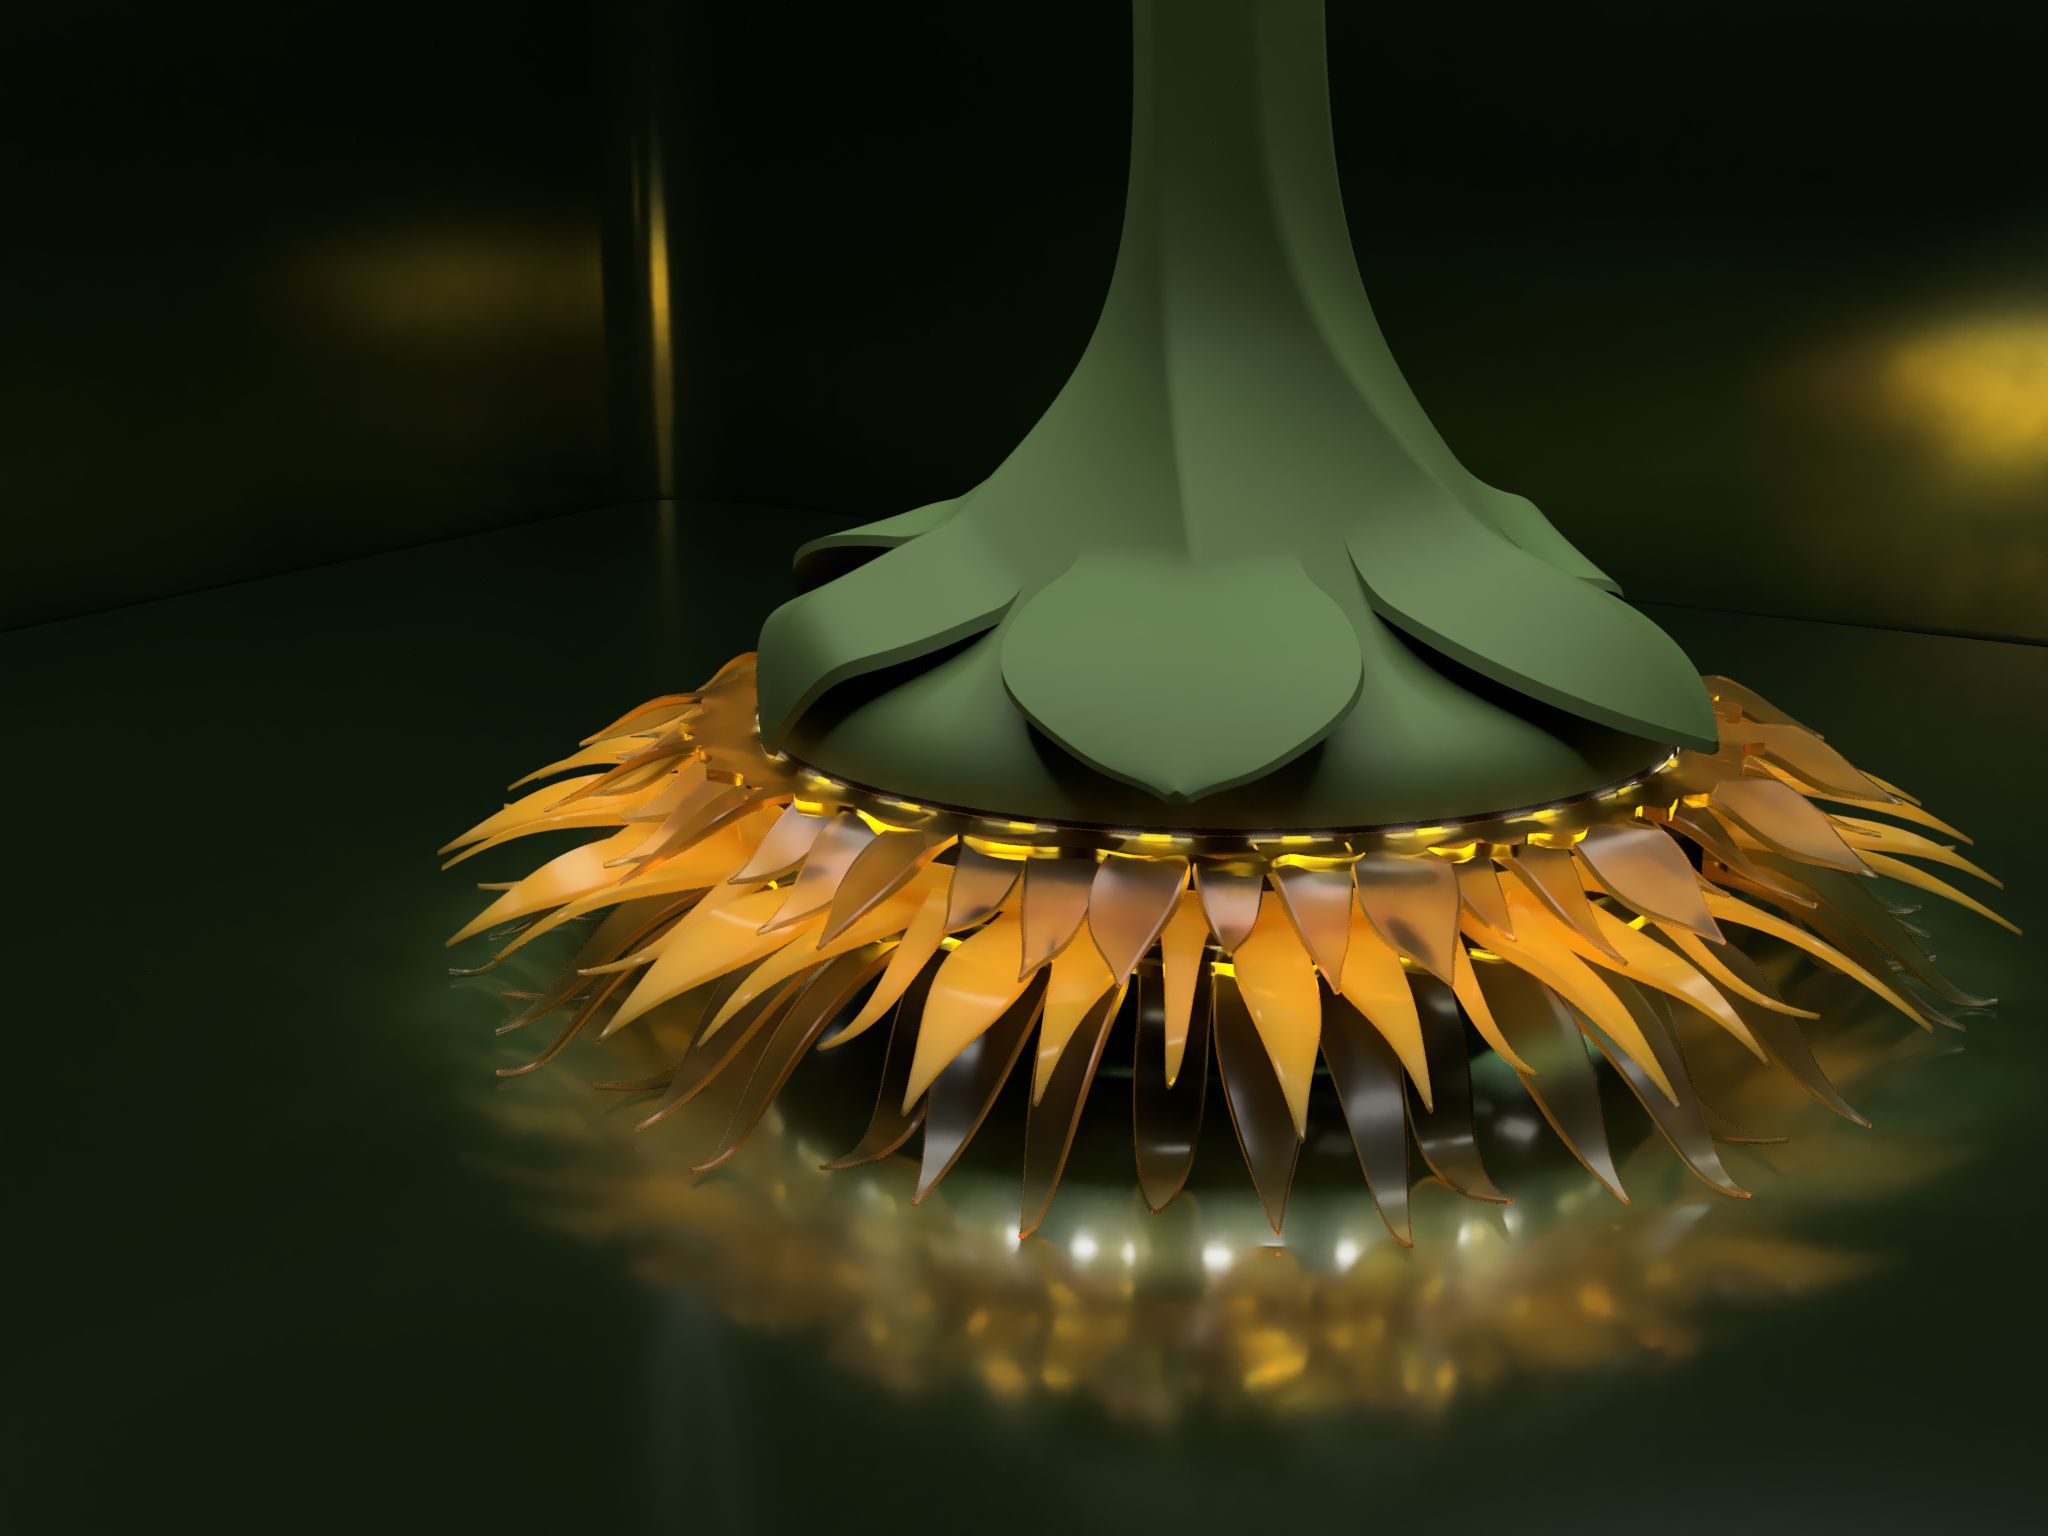 Lightflower-2018-nov-22-01-09-25am-000-customizedview8386492545-png-3500-3500